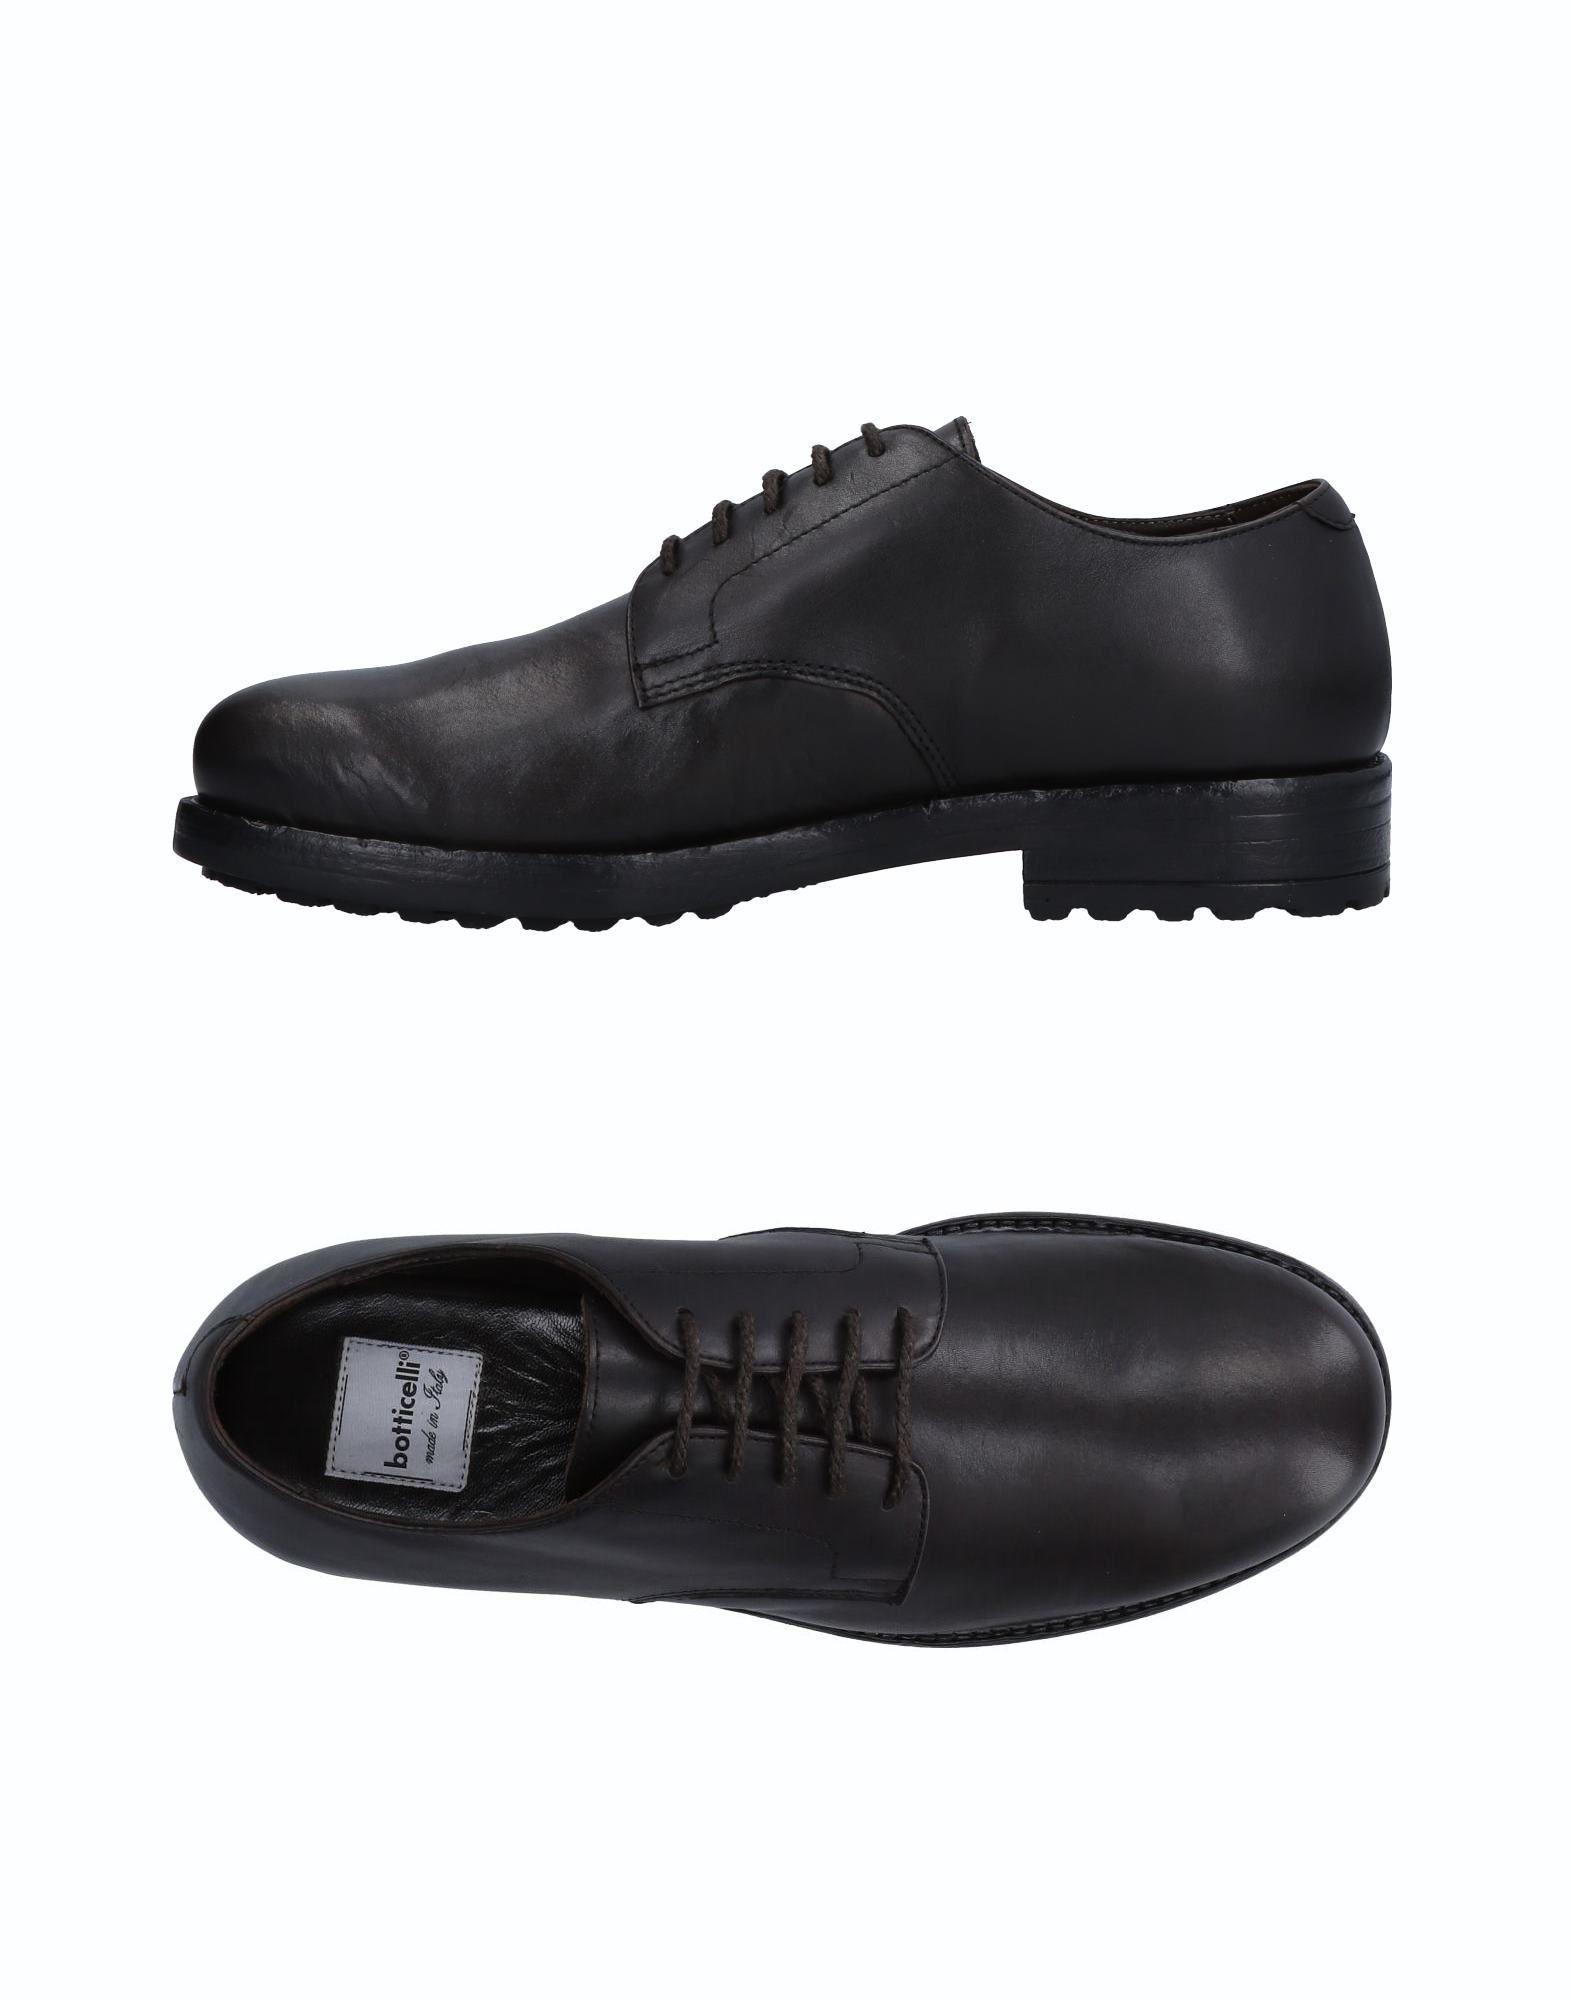 Rabatt echte Schuhe Roberto Botticelli Schnürschuhe Herren  11515475IG